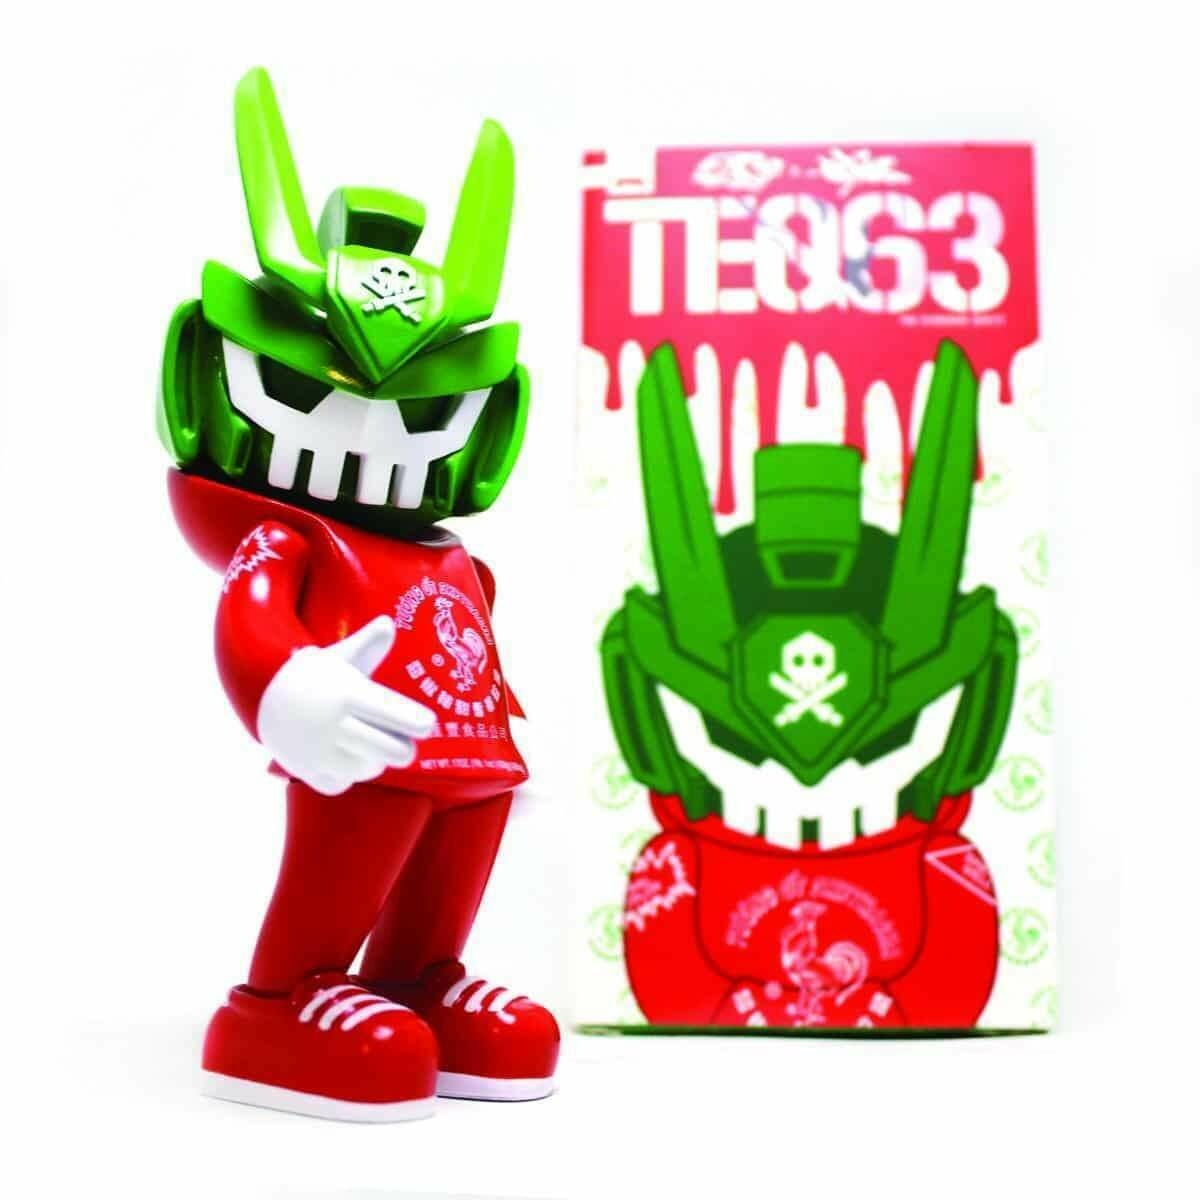 Quiccs Sketracha63 Teq 63 by Sket One x Quccs x Martian Toys